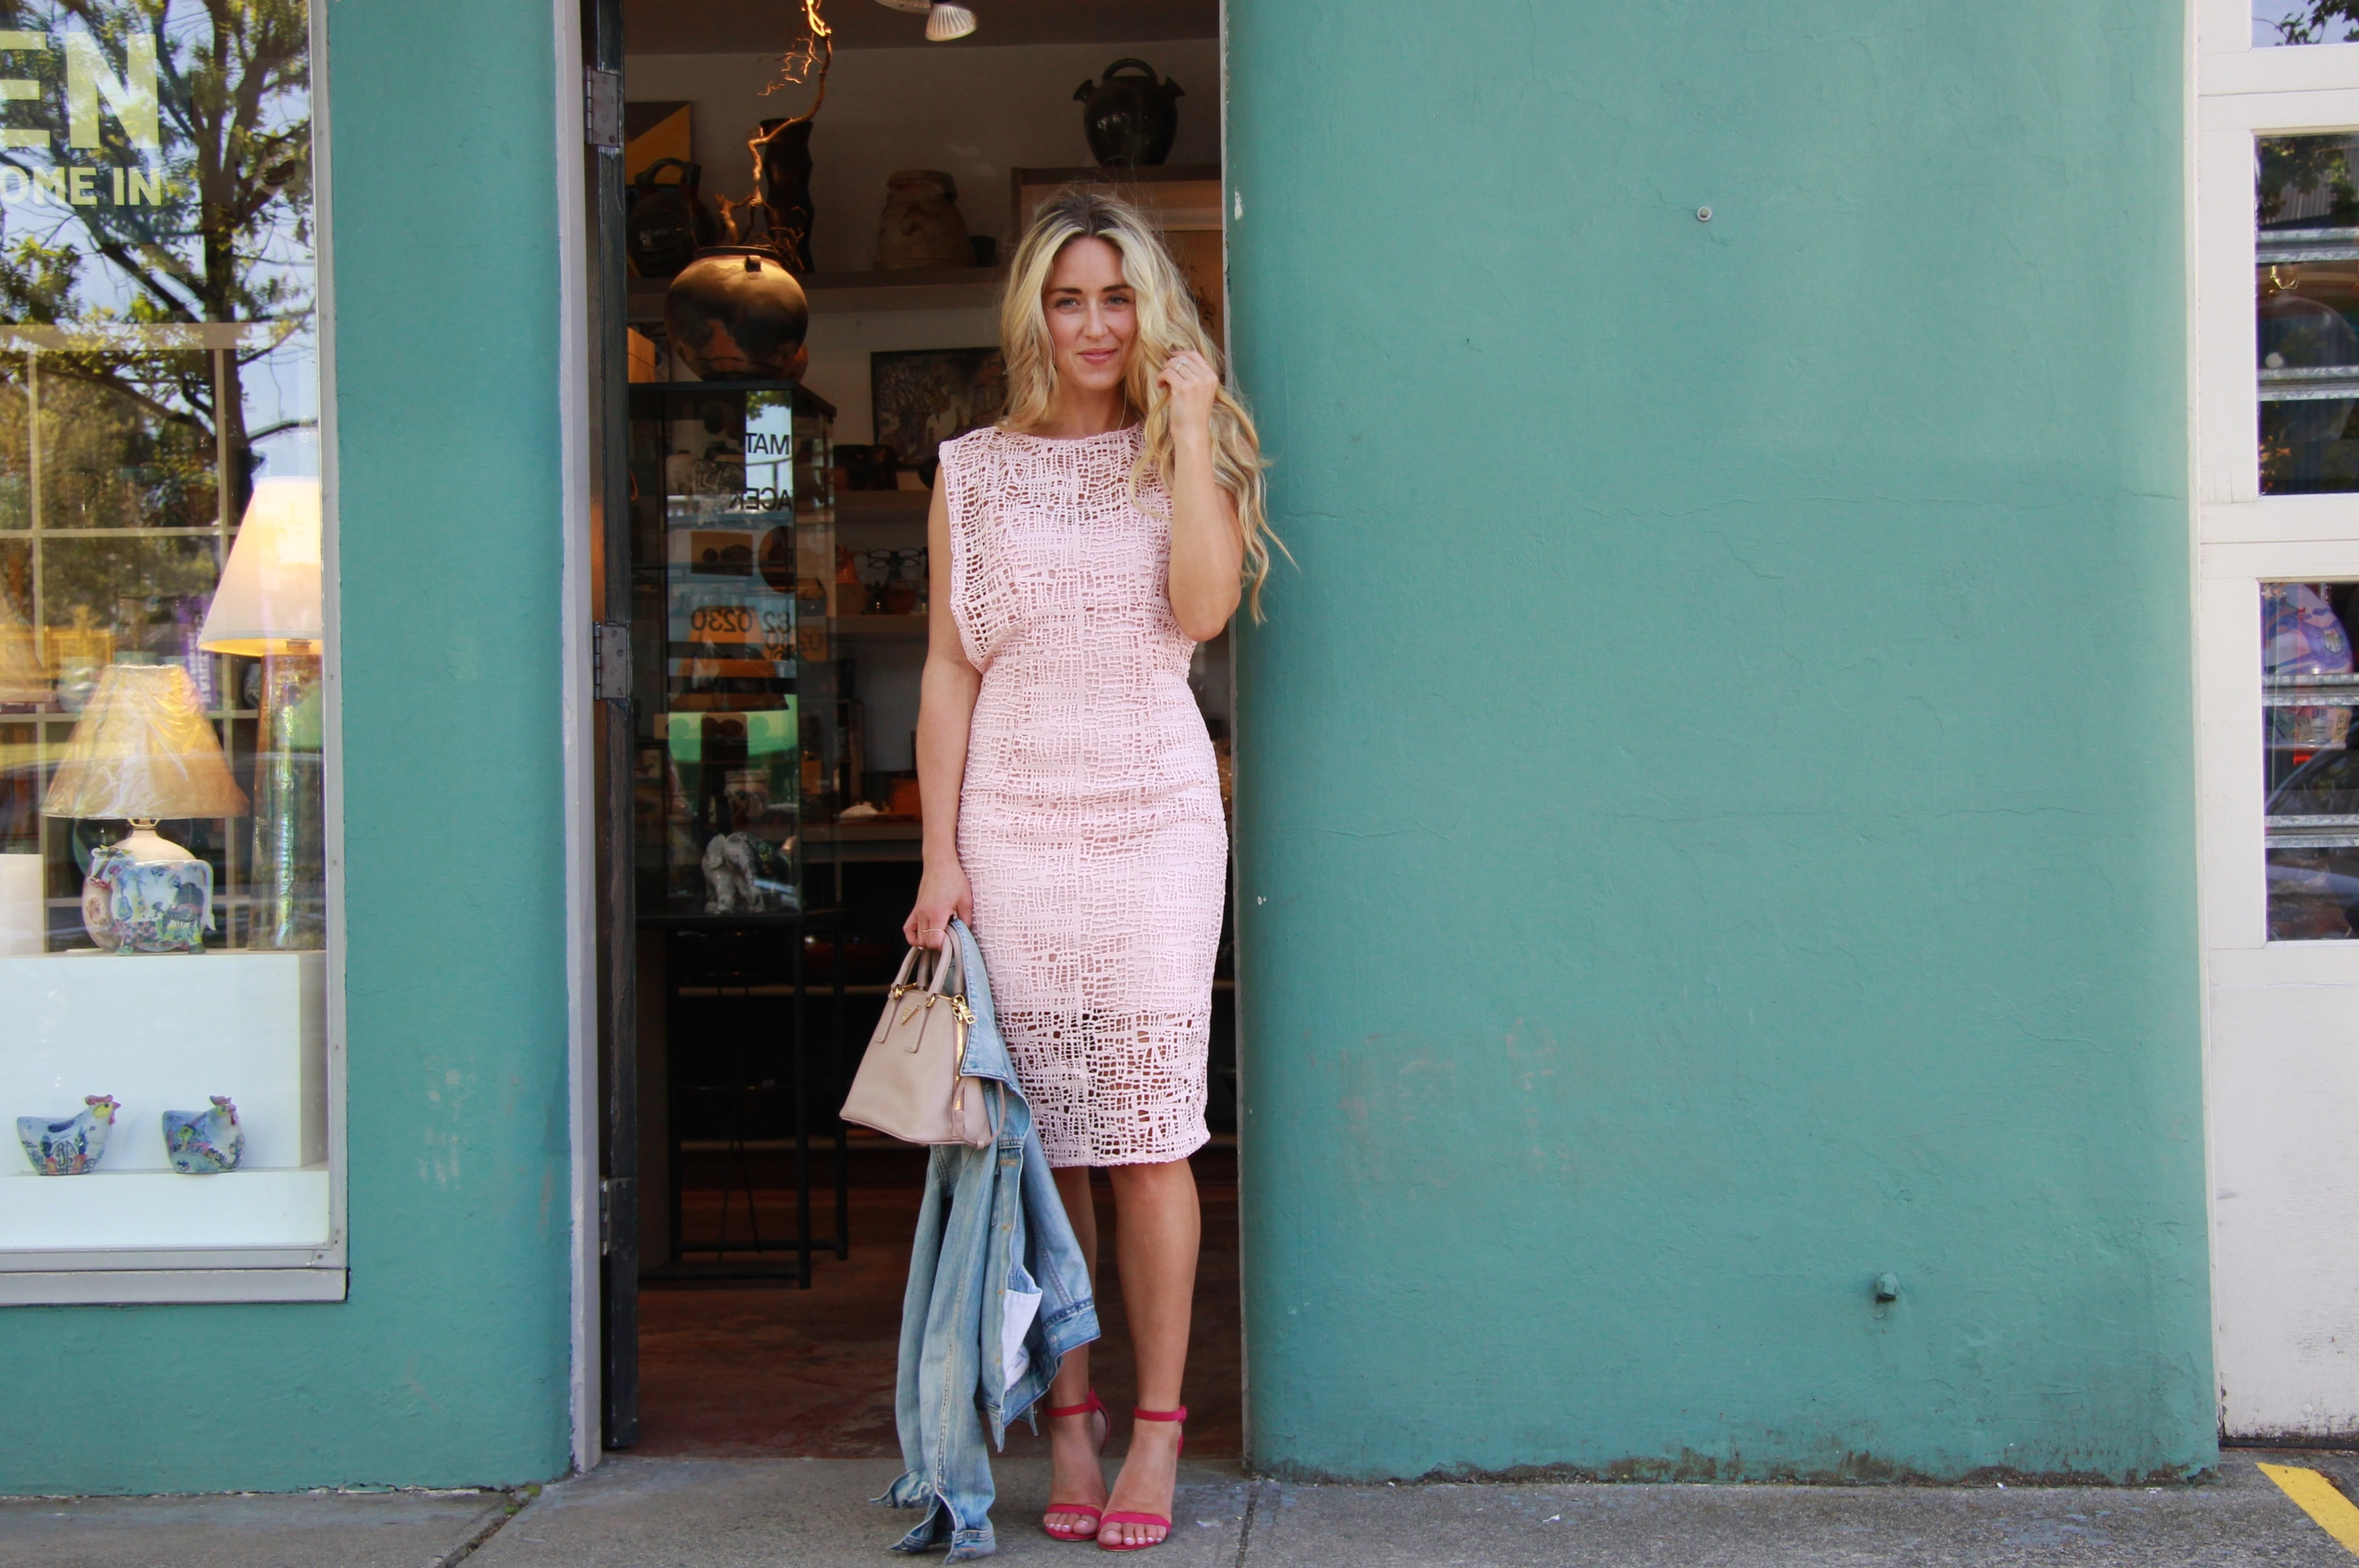 Wearing  ELLE by RW&Co  WhiteDress  &  Pink Dress  Shoemint Pumps & Sandals,  Chloé  Bag,  Prada  Bag, Aritzia Jacket